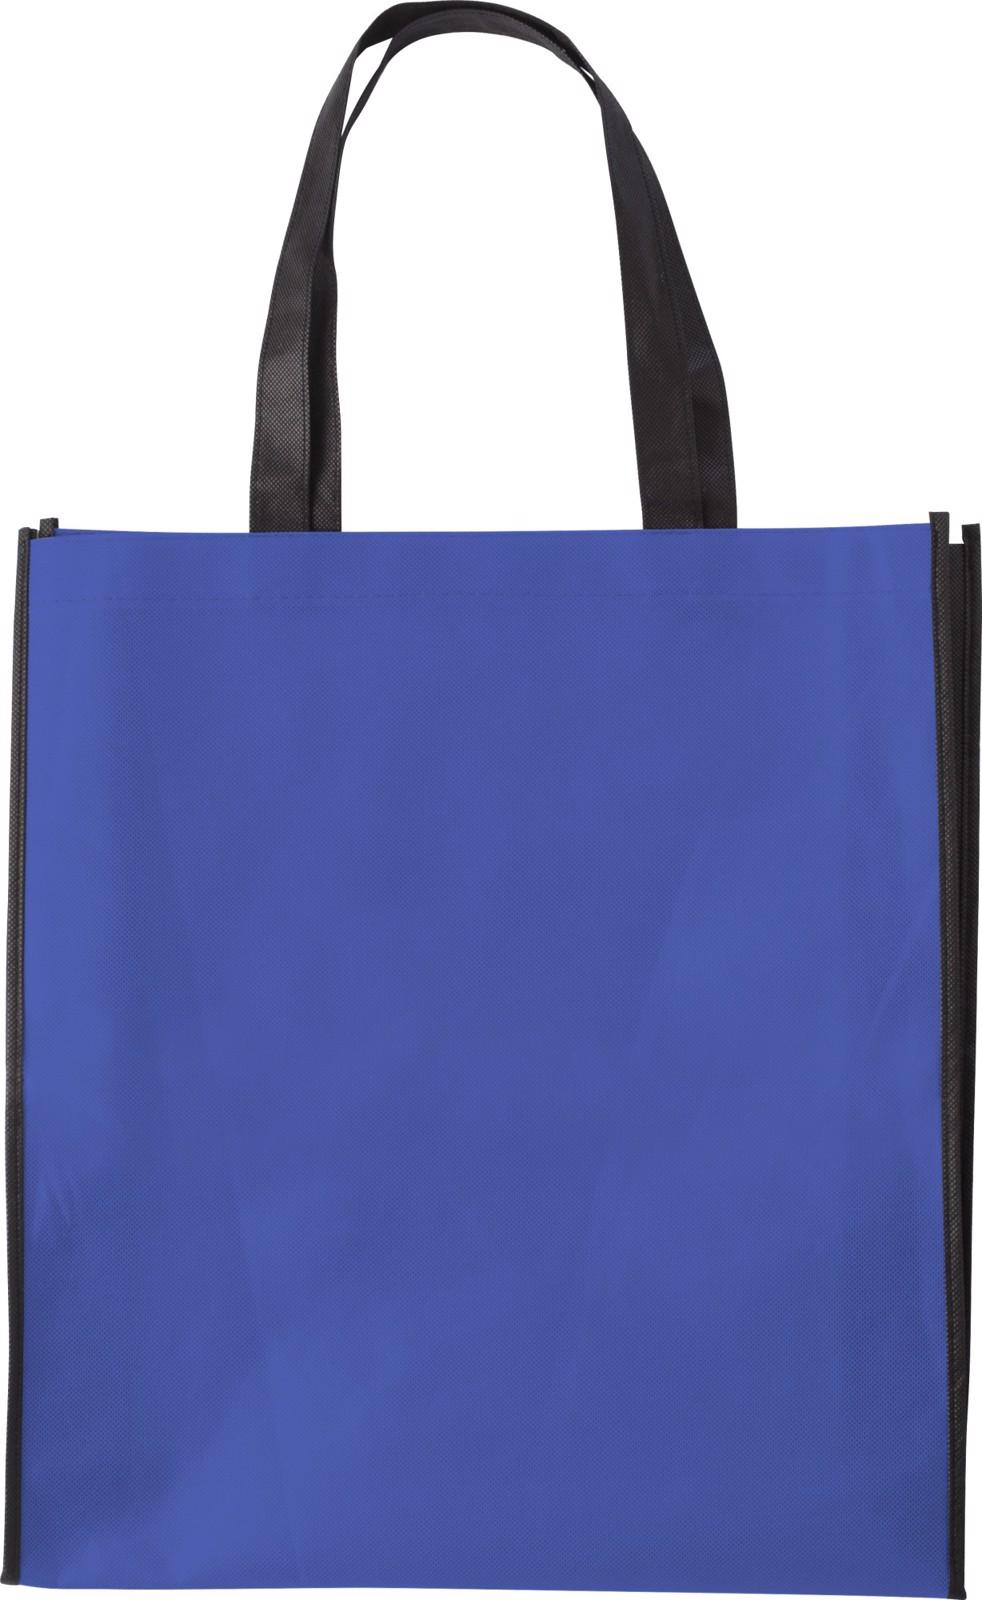 Nonwoven (80 gr/m²) shopping bag - Cobalt Blue